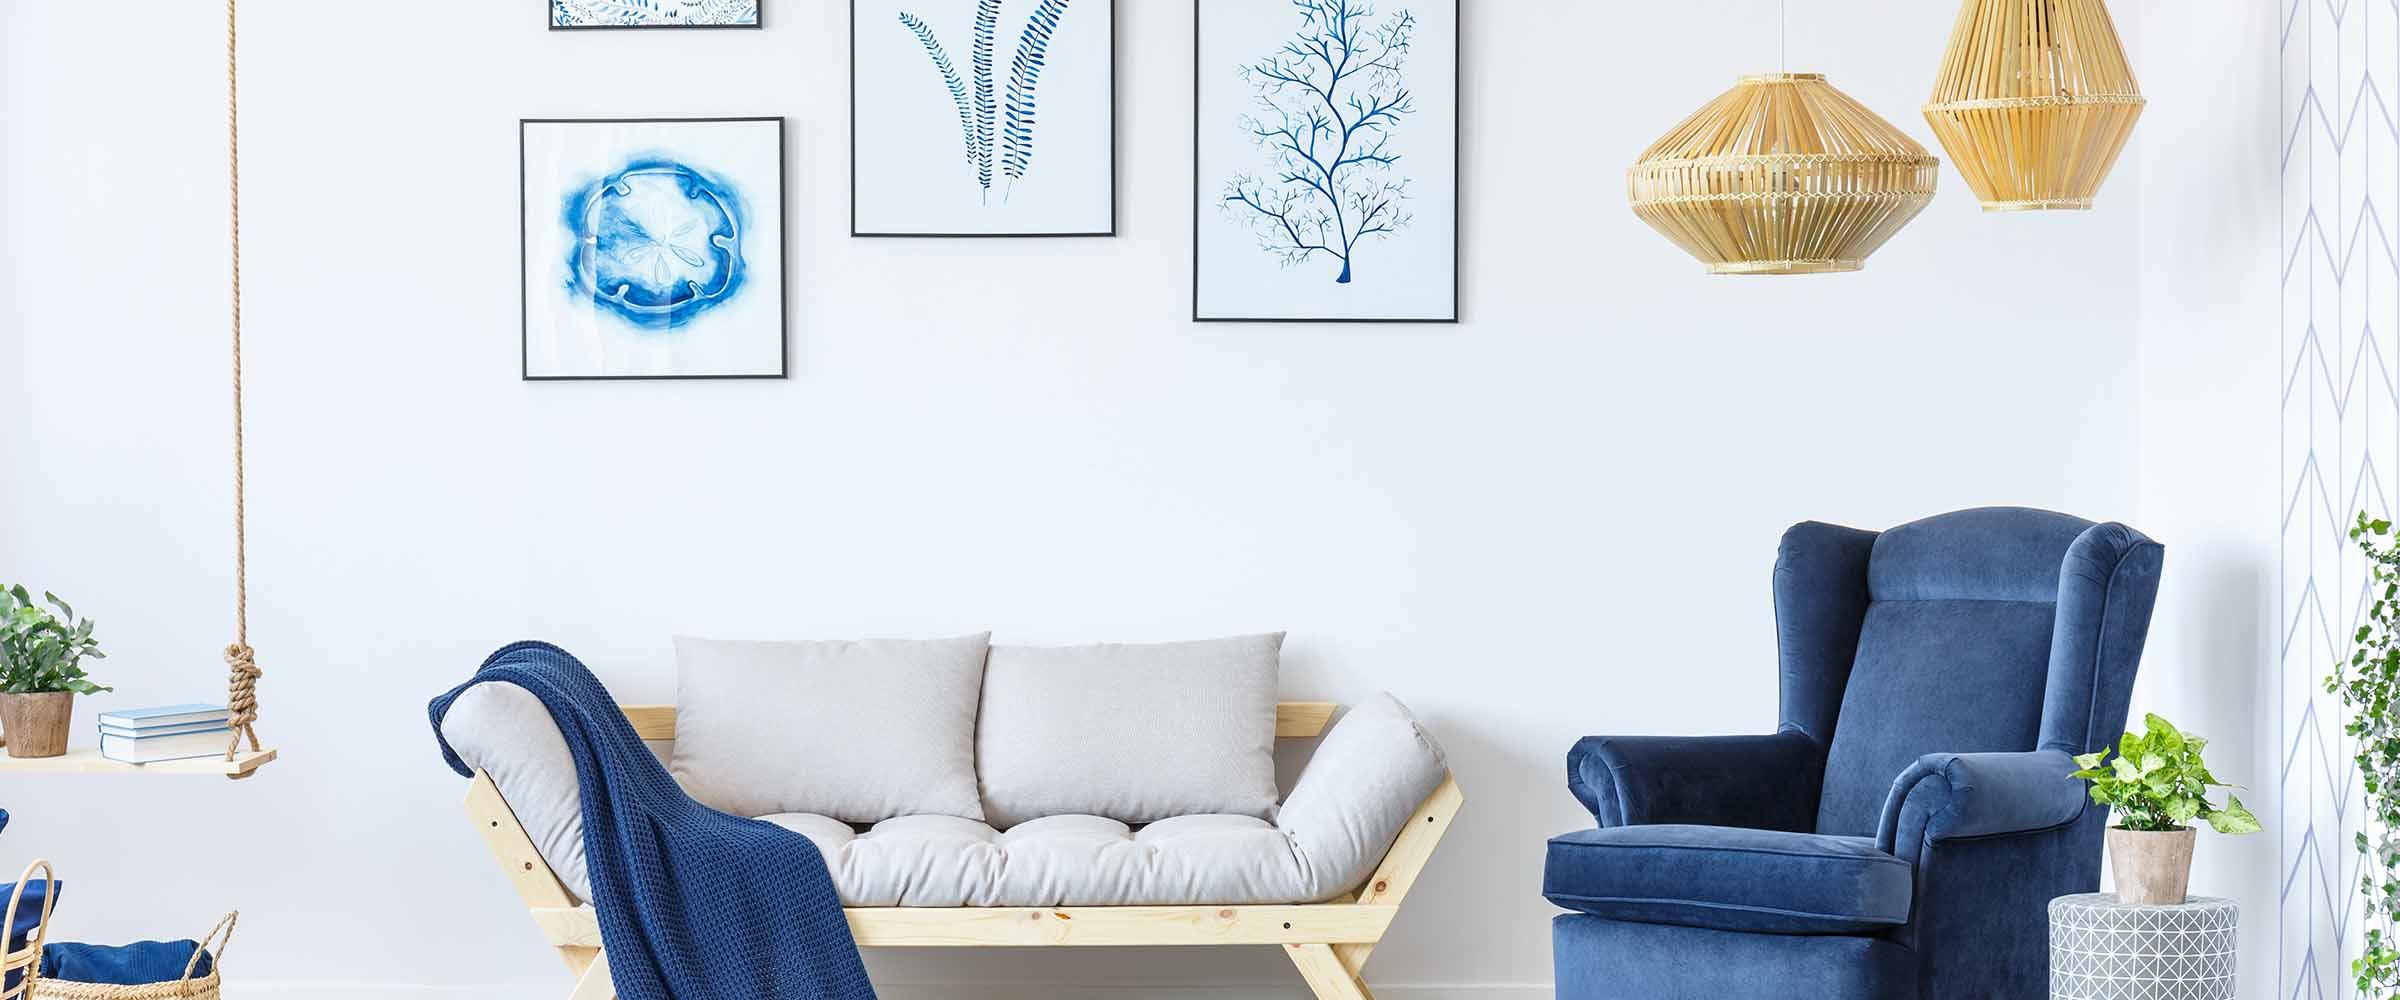 Premier Ornament XL - Luxe brede ornament lijsten